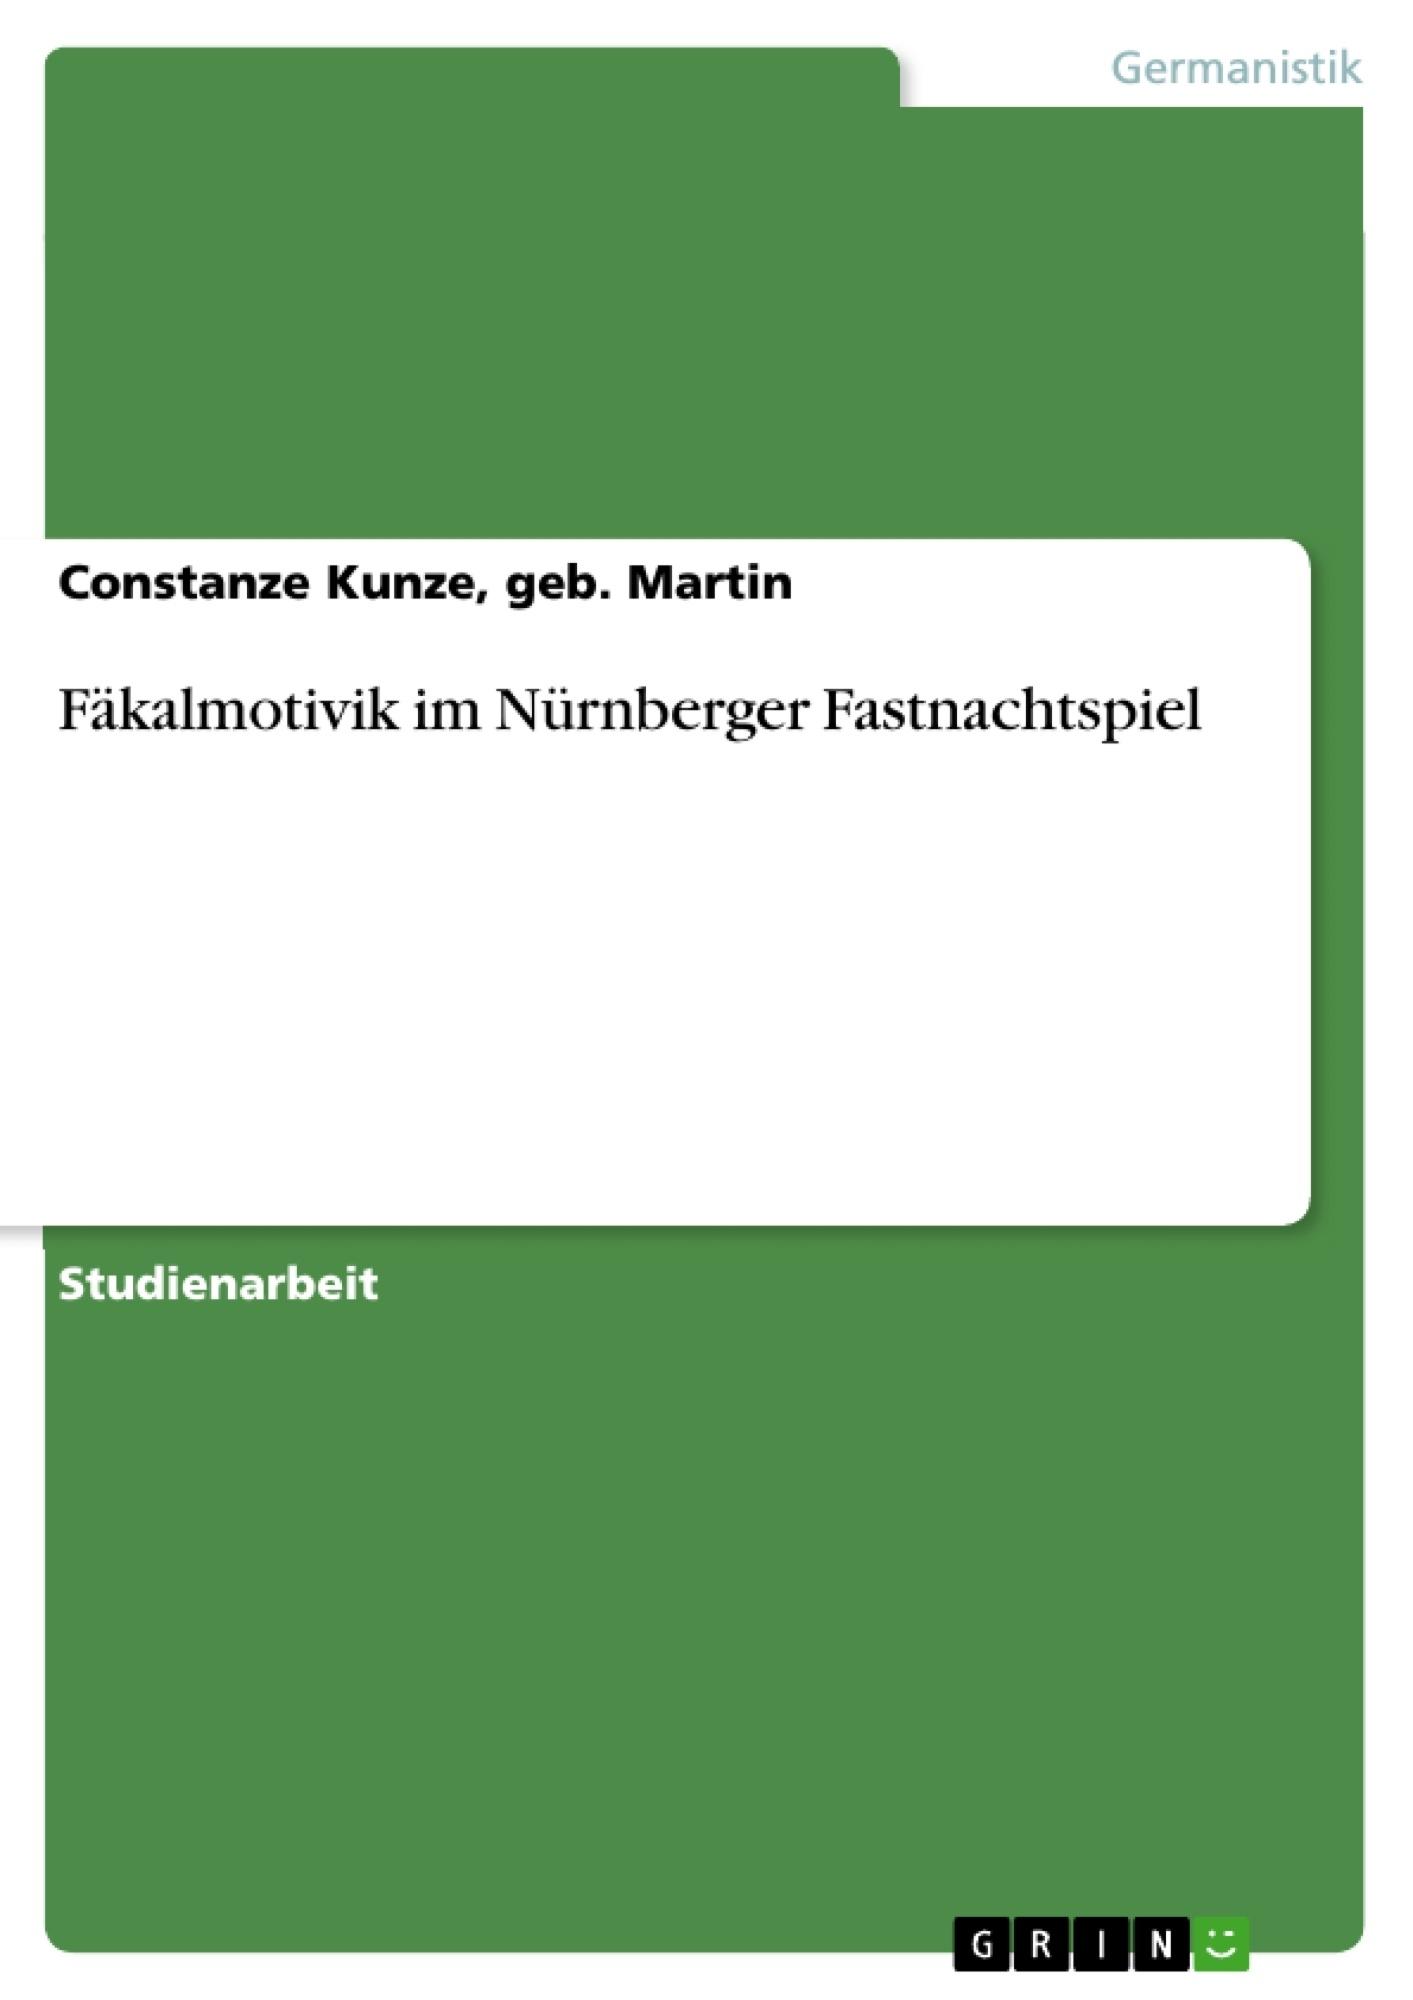 Titel: Fäkalmotivik im Nürnberger Fastnachtspiel